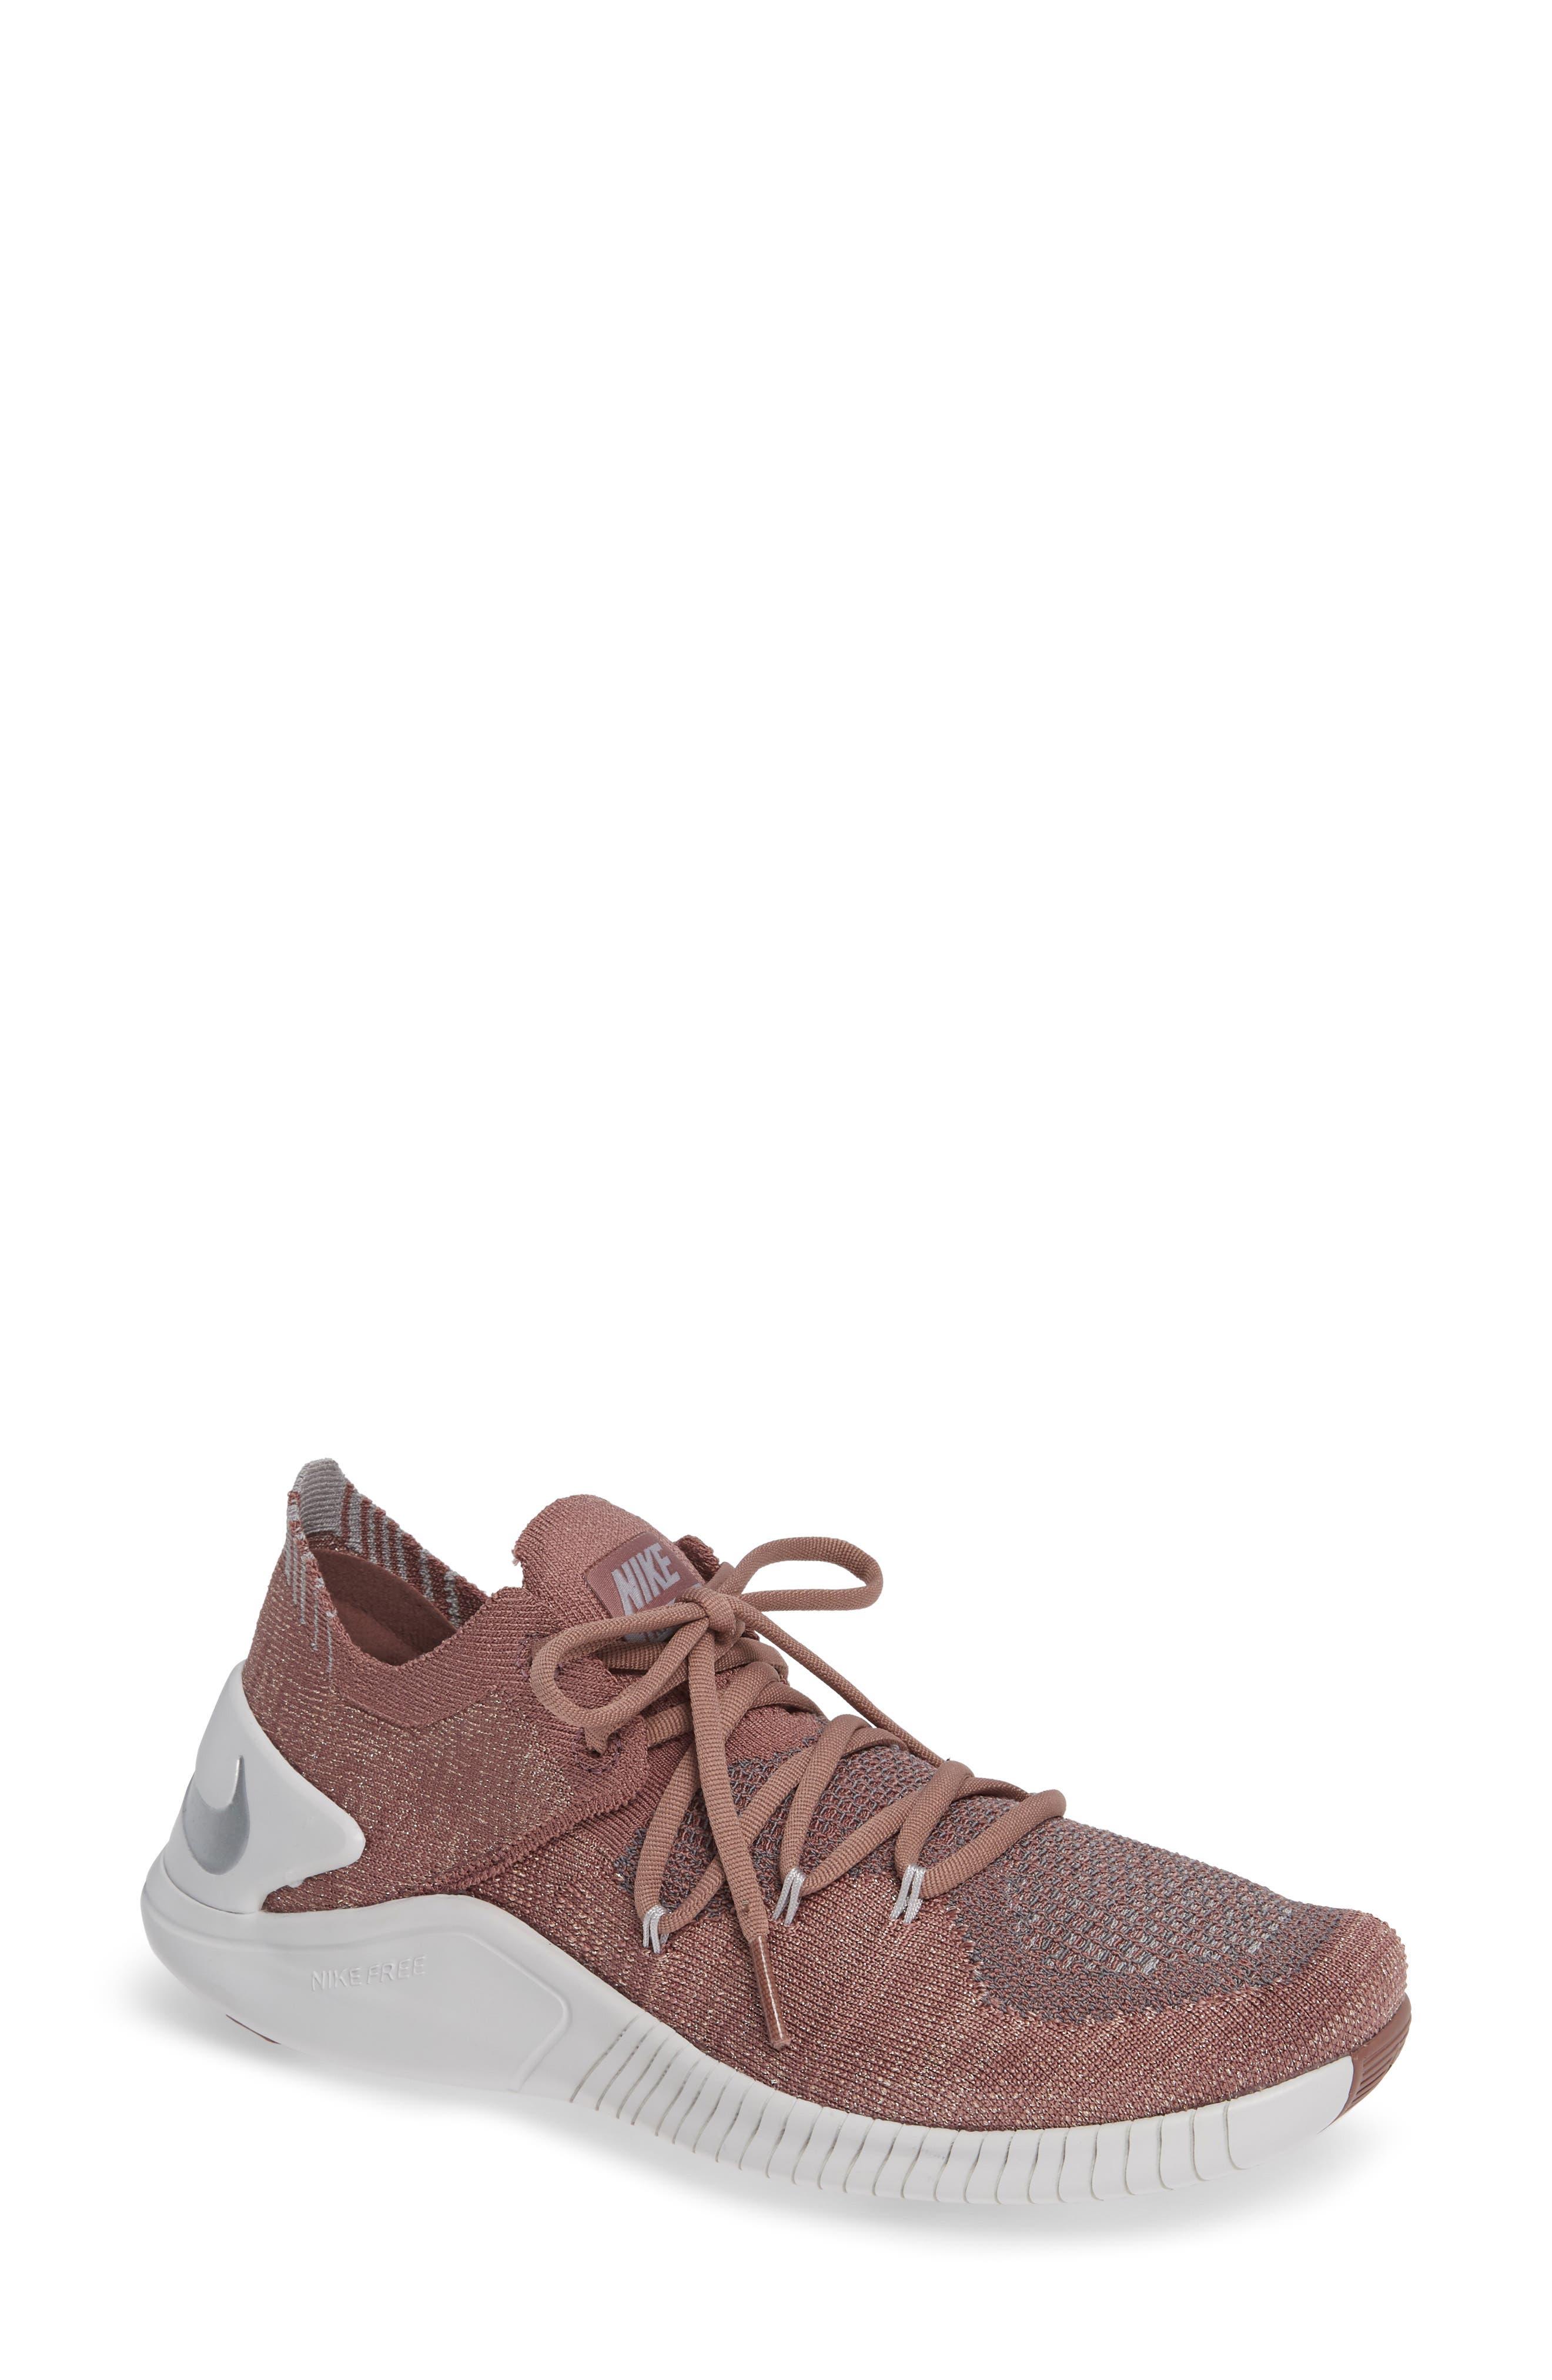 ,                             Free TR Flyknit 3 Training Shoe,                             Main thumbnail 78, color,                             650